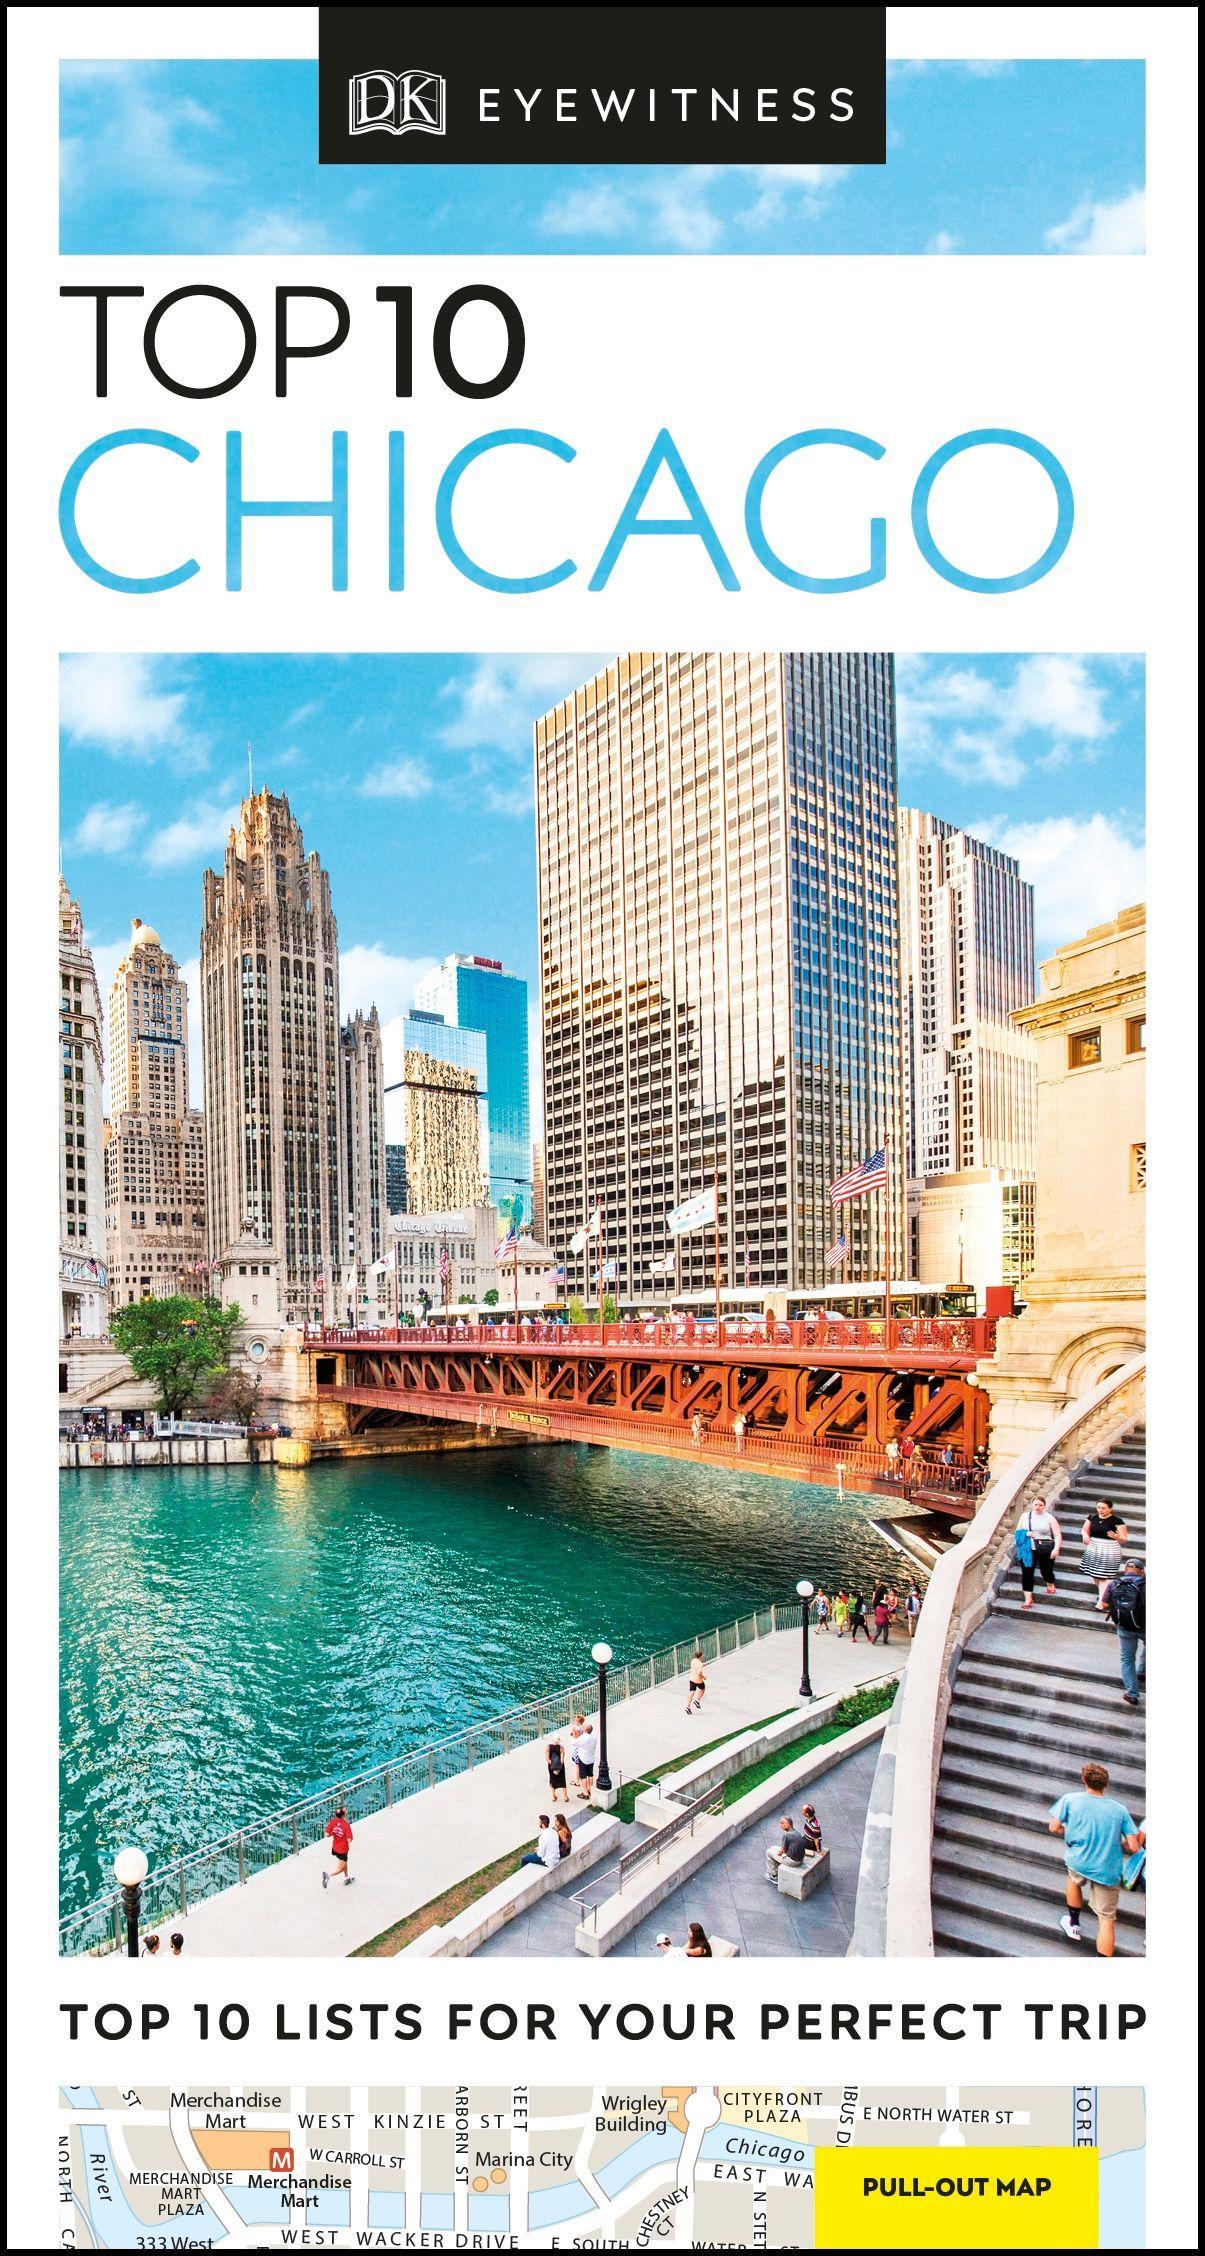 Top 10 Chicago (DK Eyewitness Travel Guide) by DK Eyewitness Travel